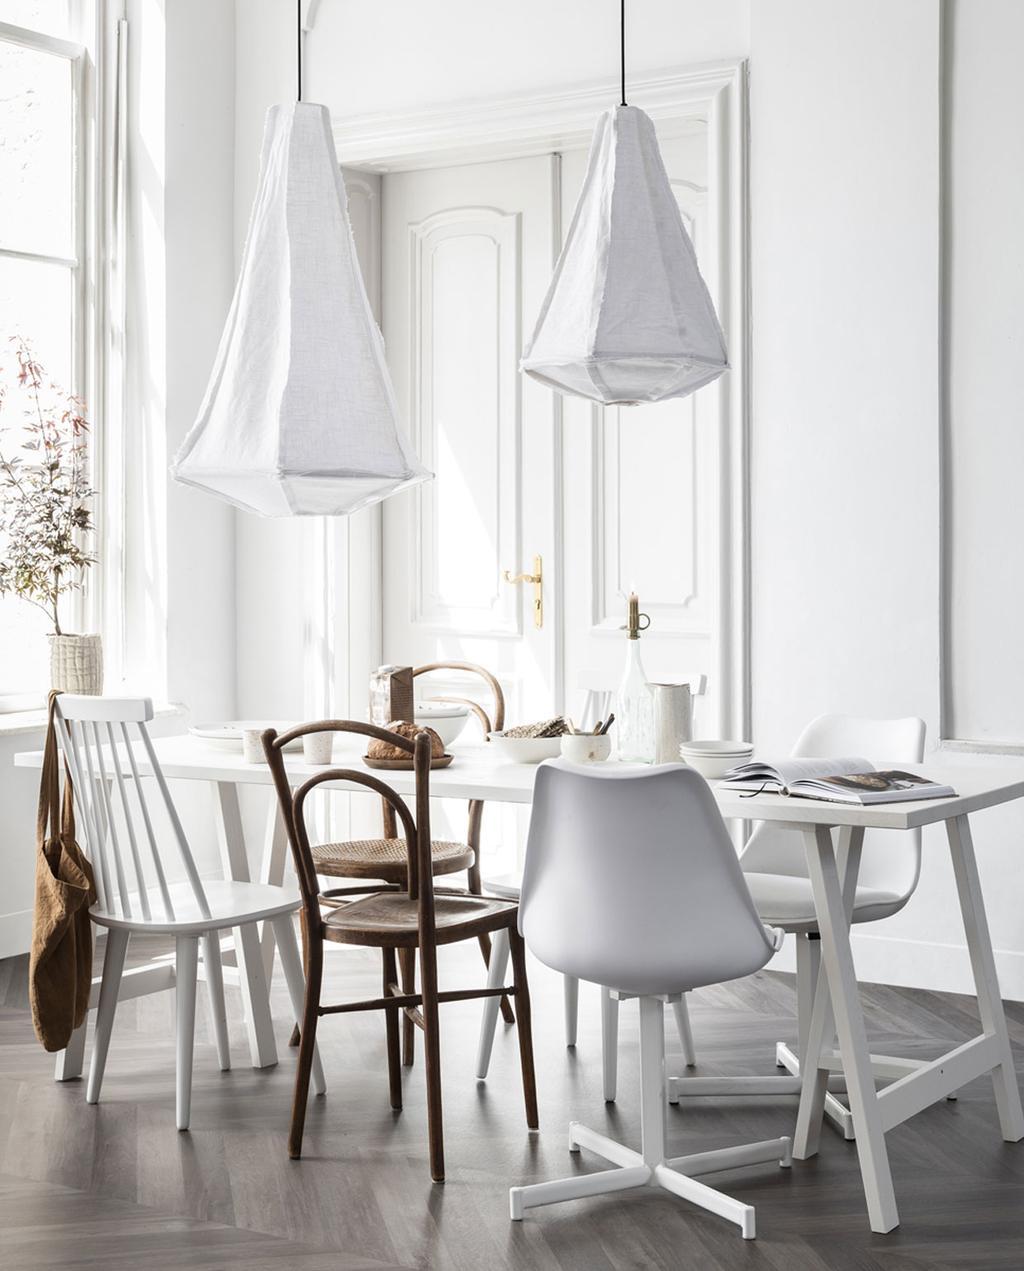 vtwonen feestkalender 2019 |  witte tafels met witte en bruine stoelen